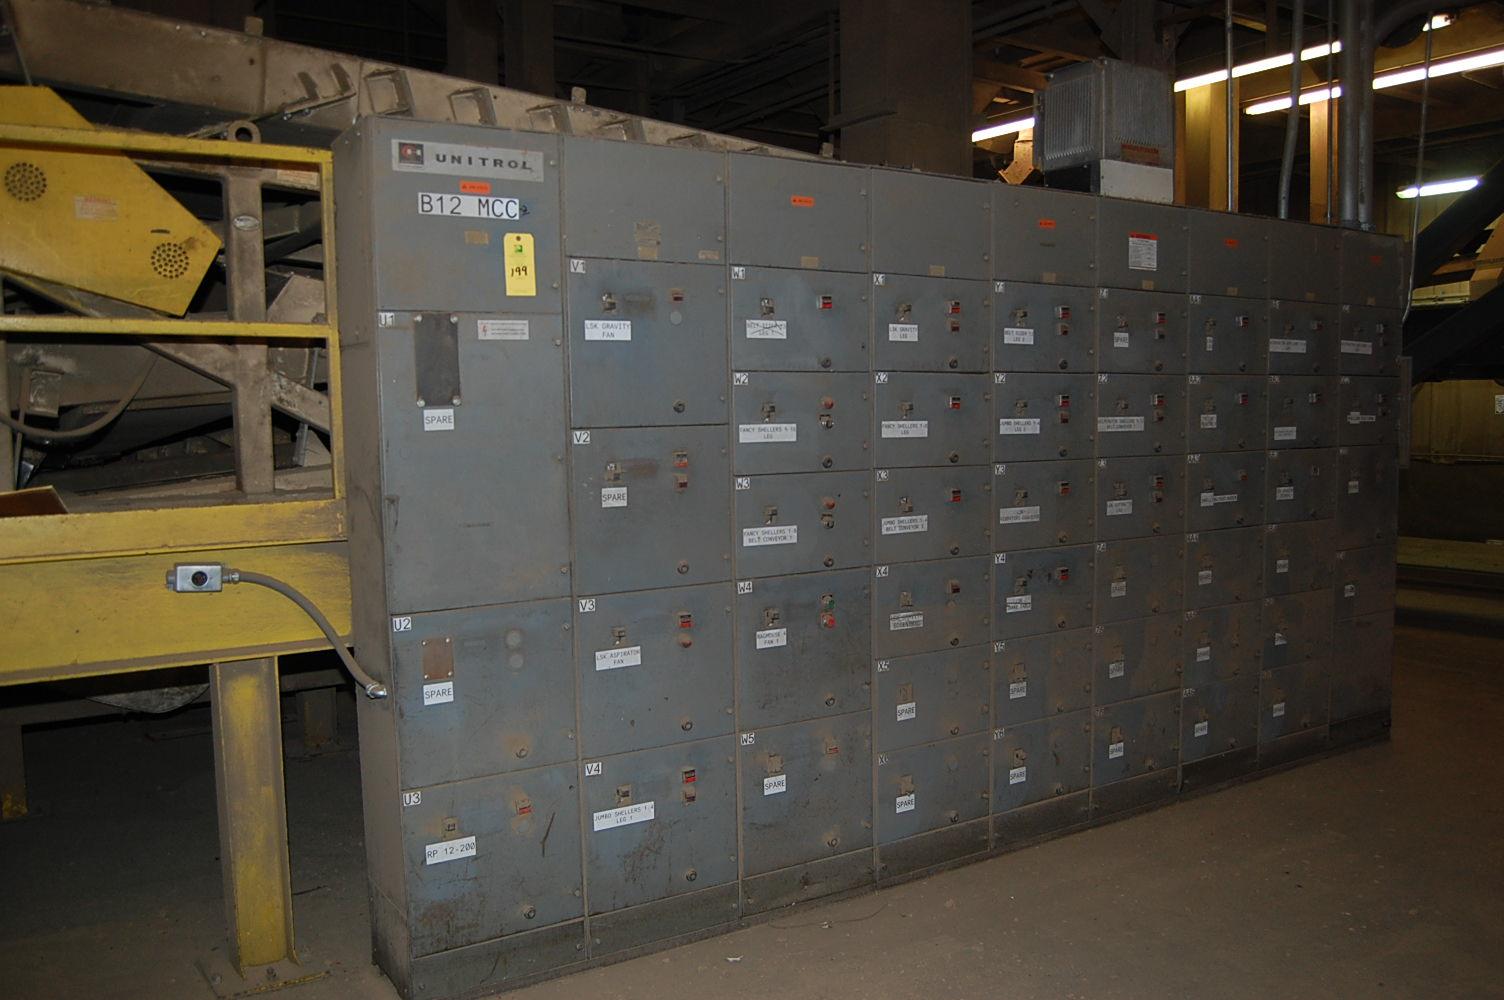 Cutler hammer unitrol motor control center id b12 mcc 2 for Cutler hammer motor control center